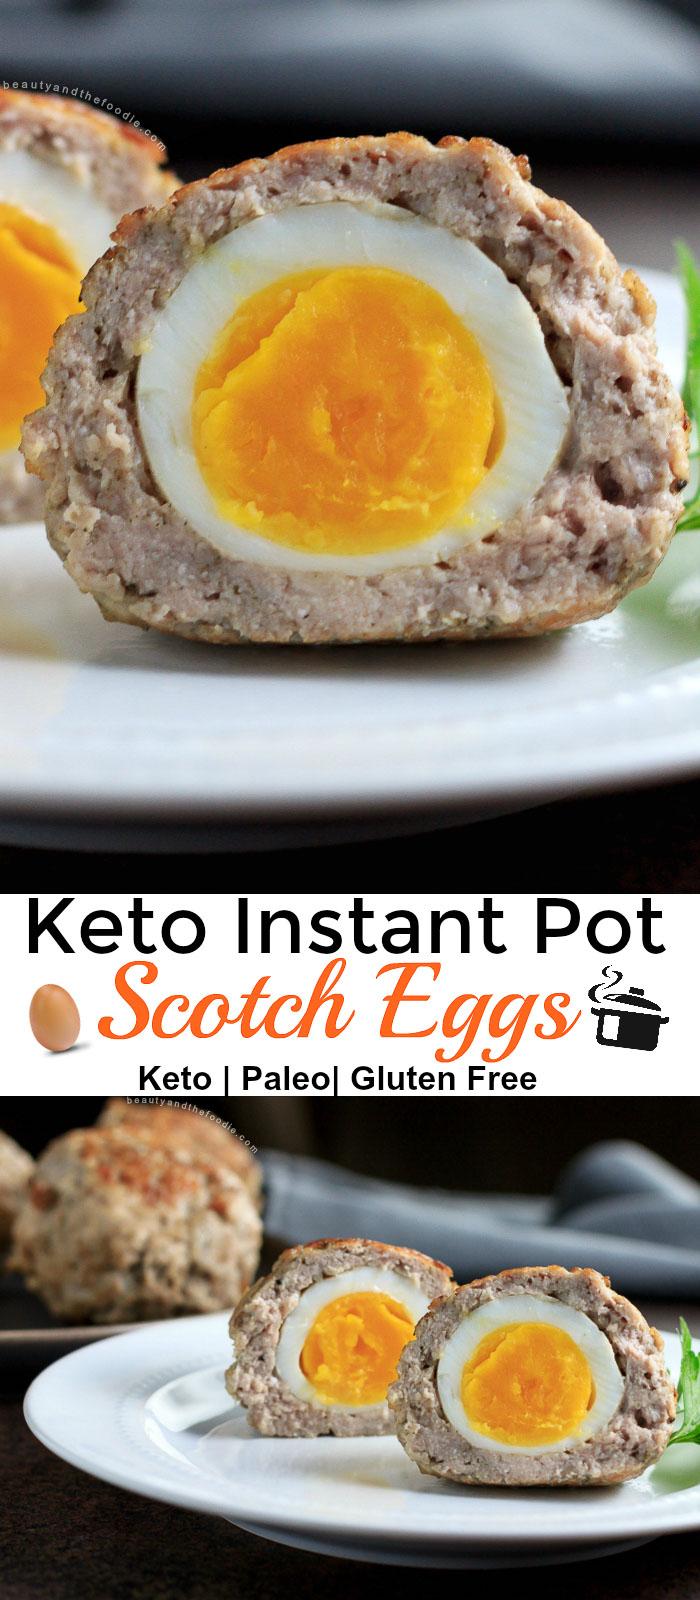 Instant Pot Keto Scotch Eggs -   18 healthy recipes Breakfast keto ideas